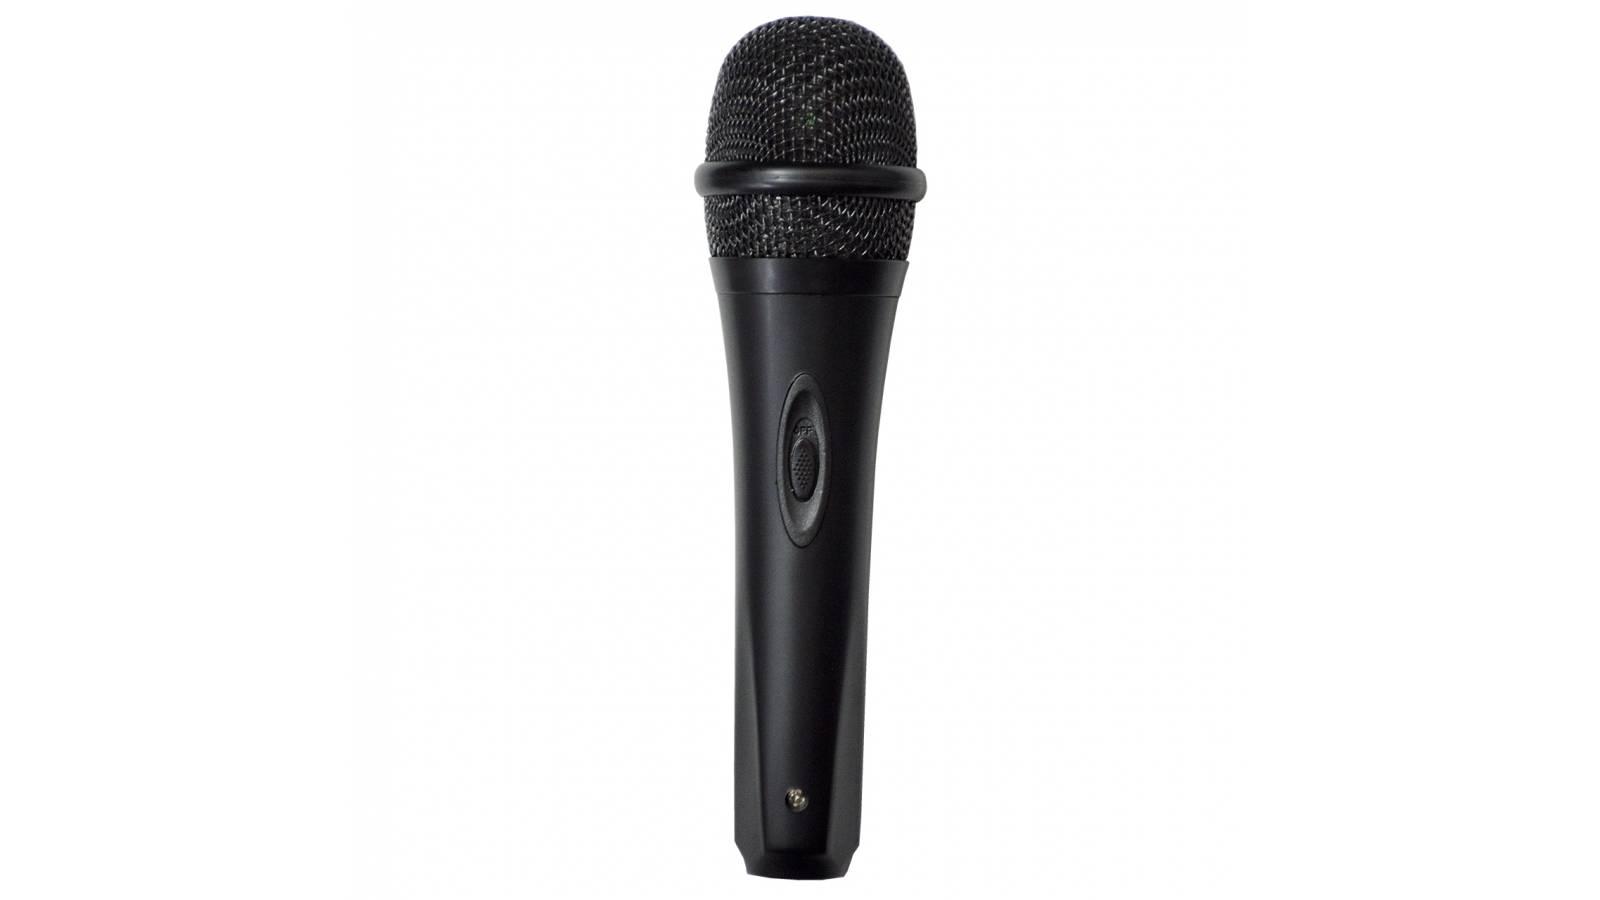 Micrófono Alámbrico / Cableado / Dinámico, Ideal para Karaoke GM-156